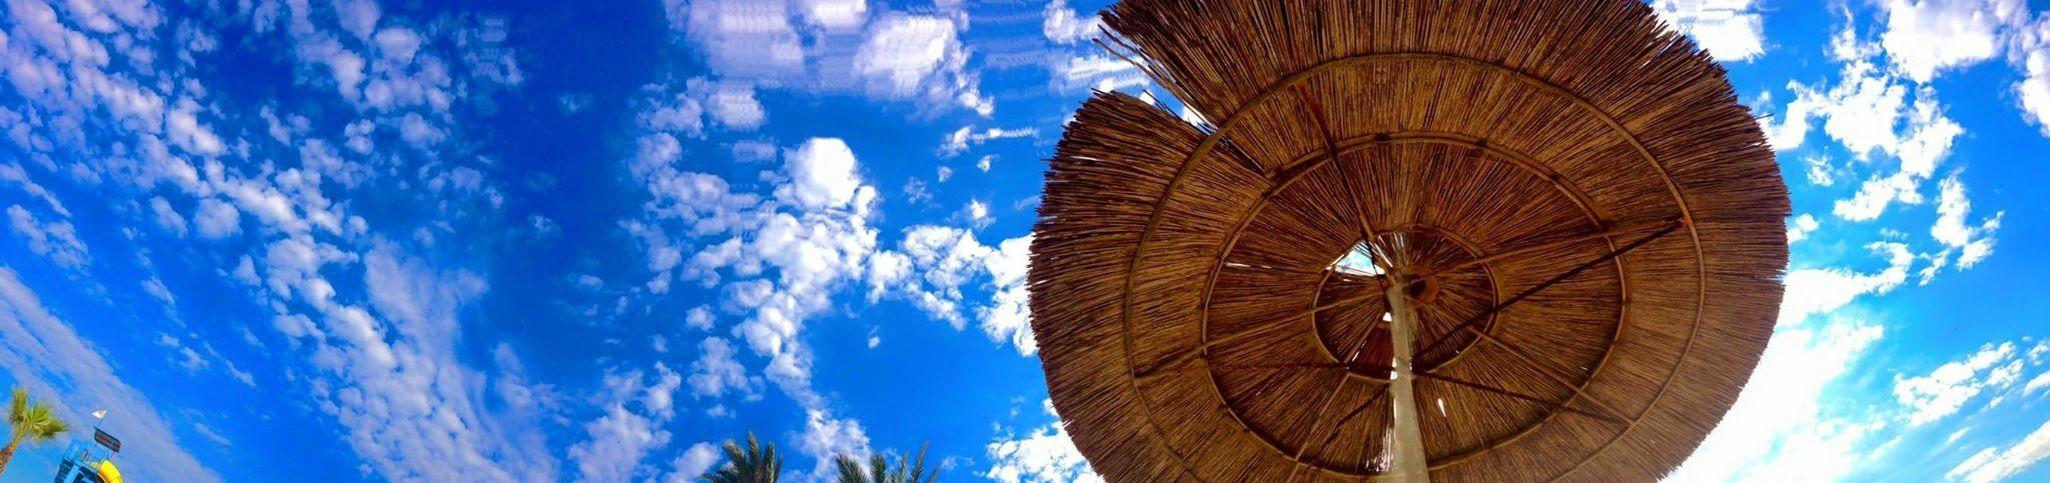 Blue Sky Summer ☀ Beach in Ayianapa